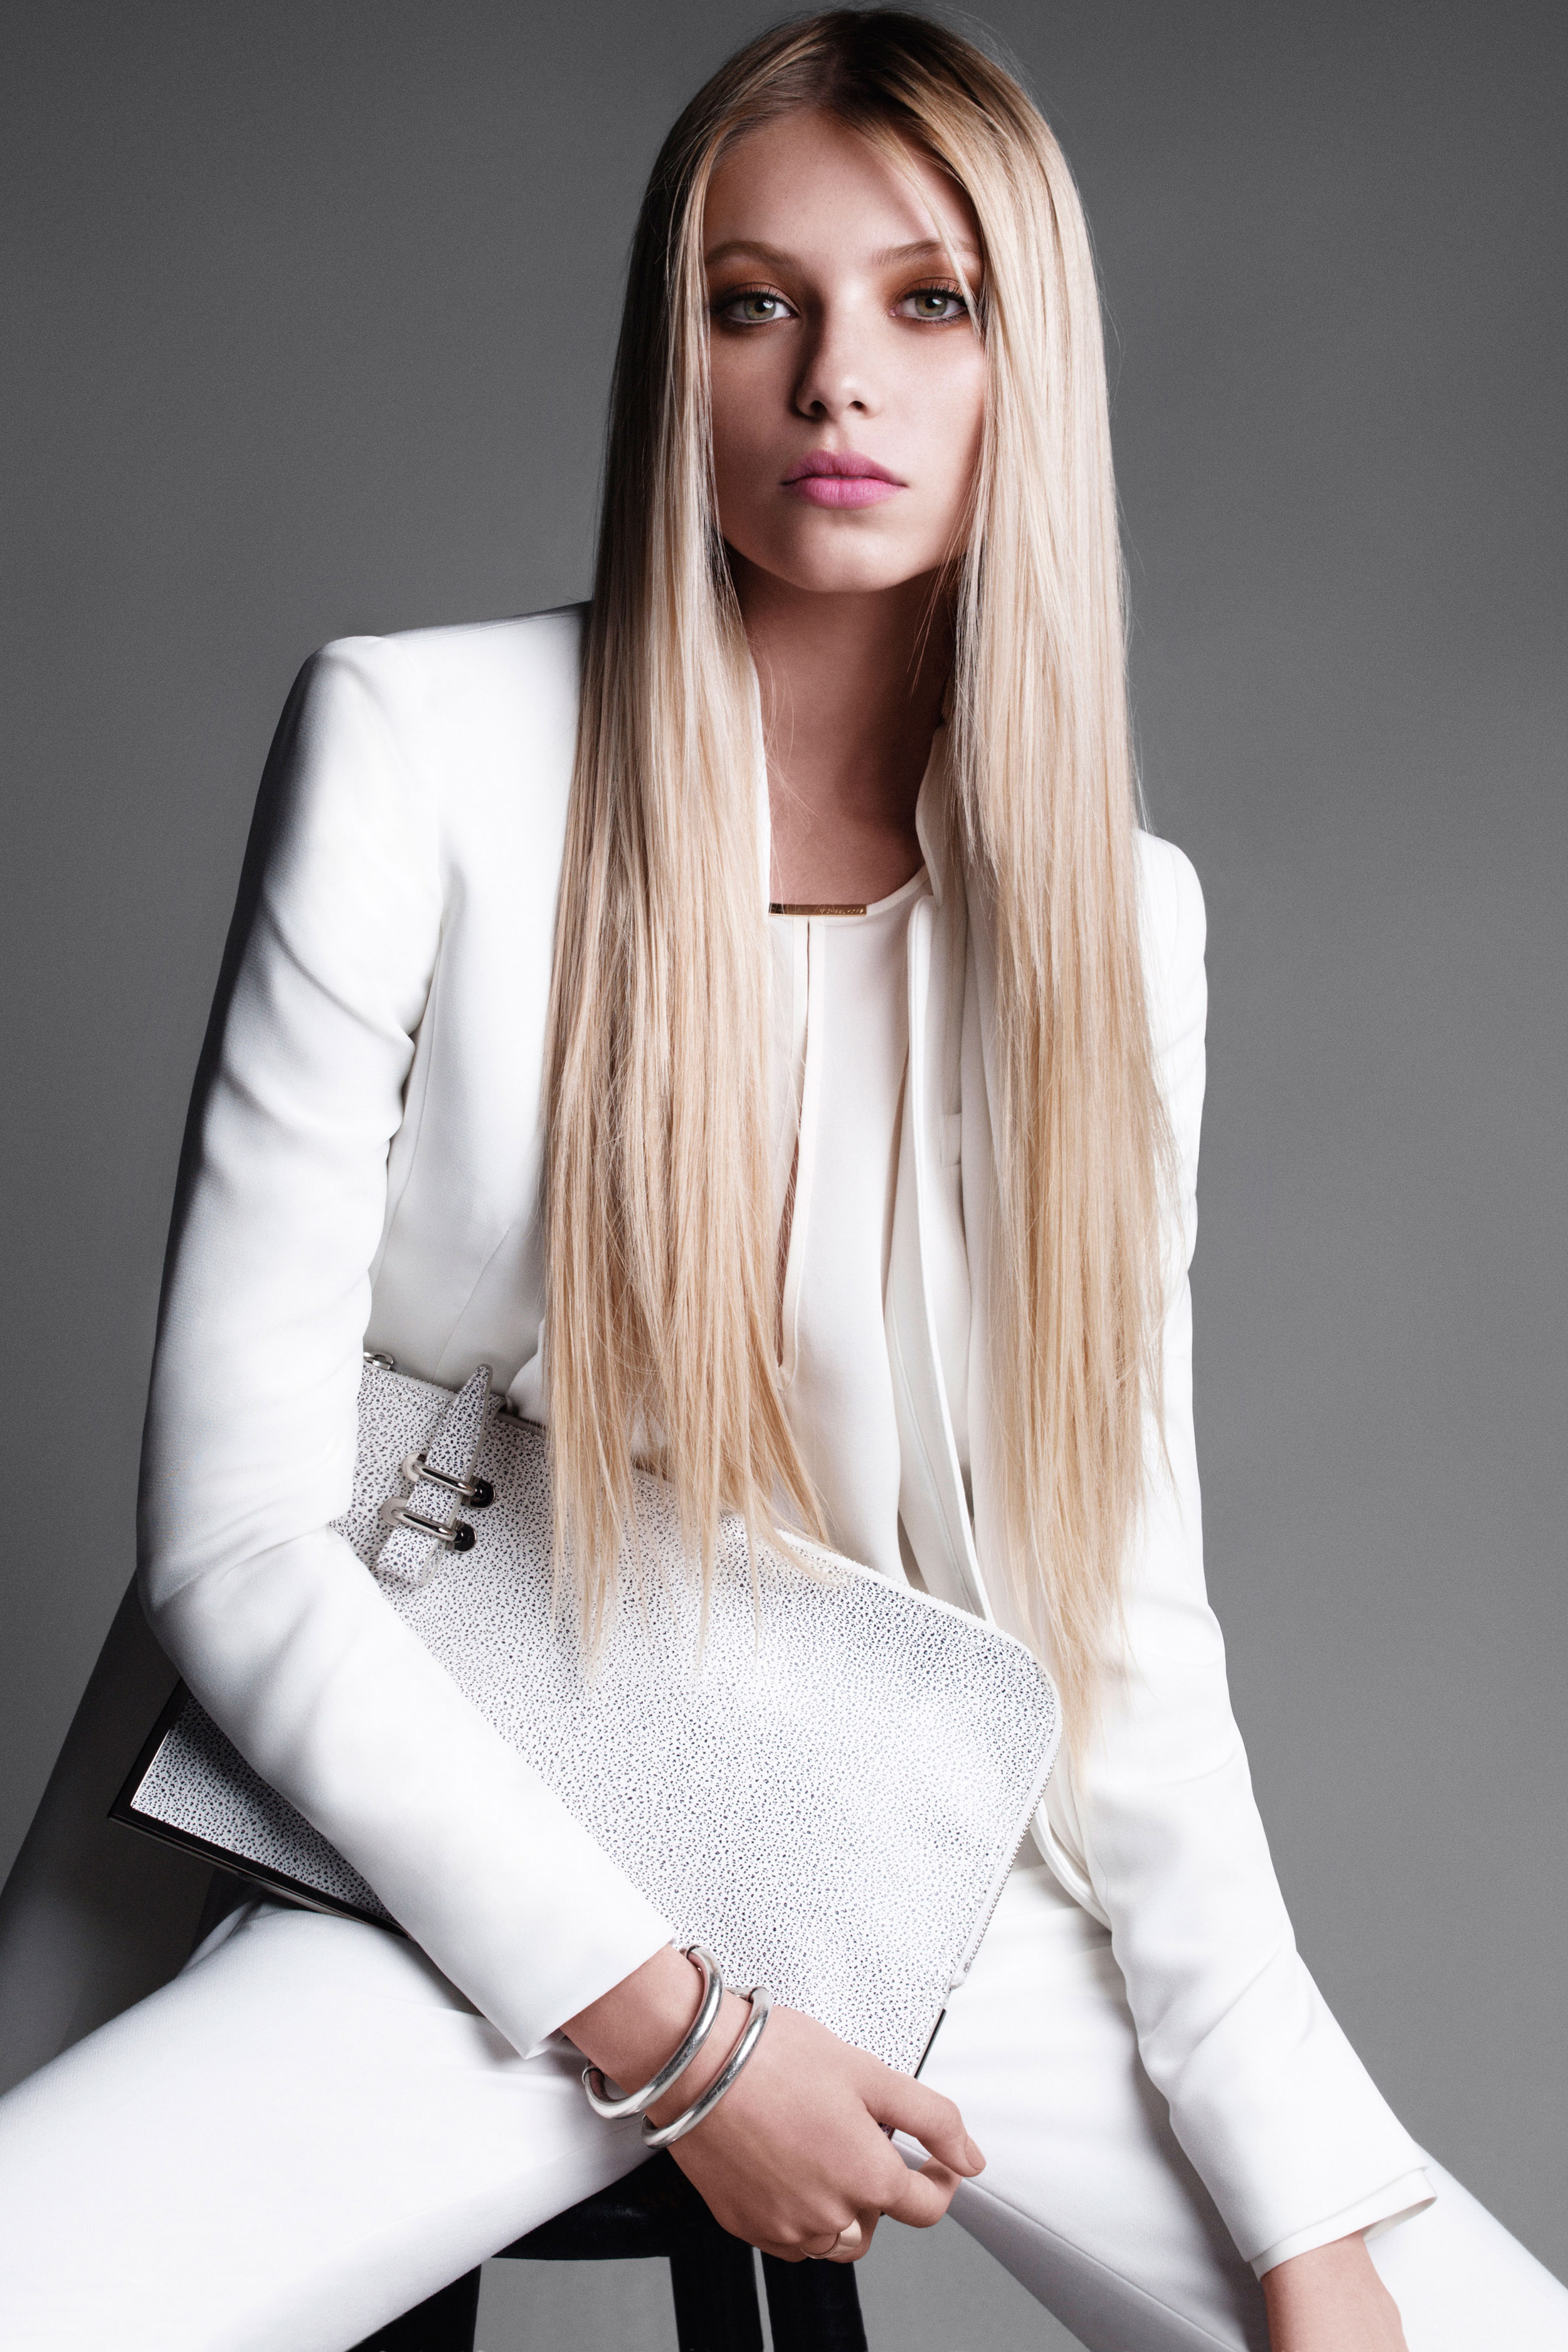 Hair_Model_2_715929741